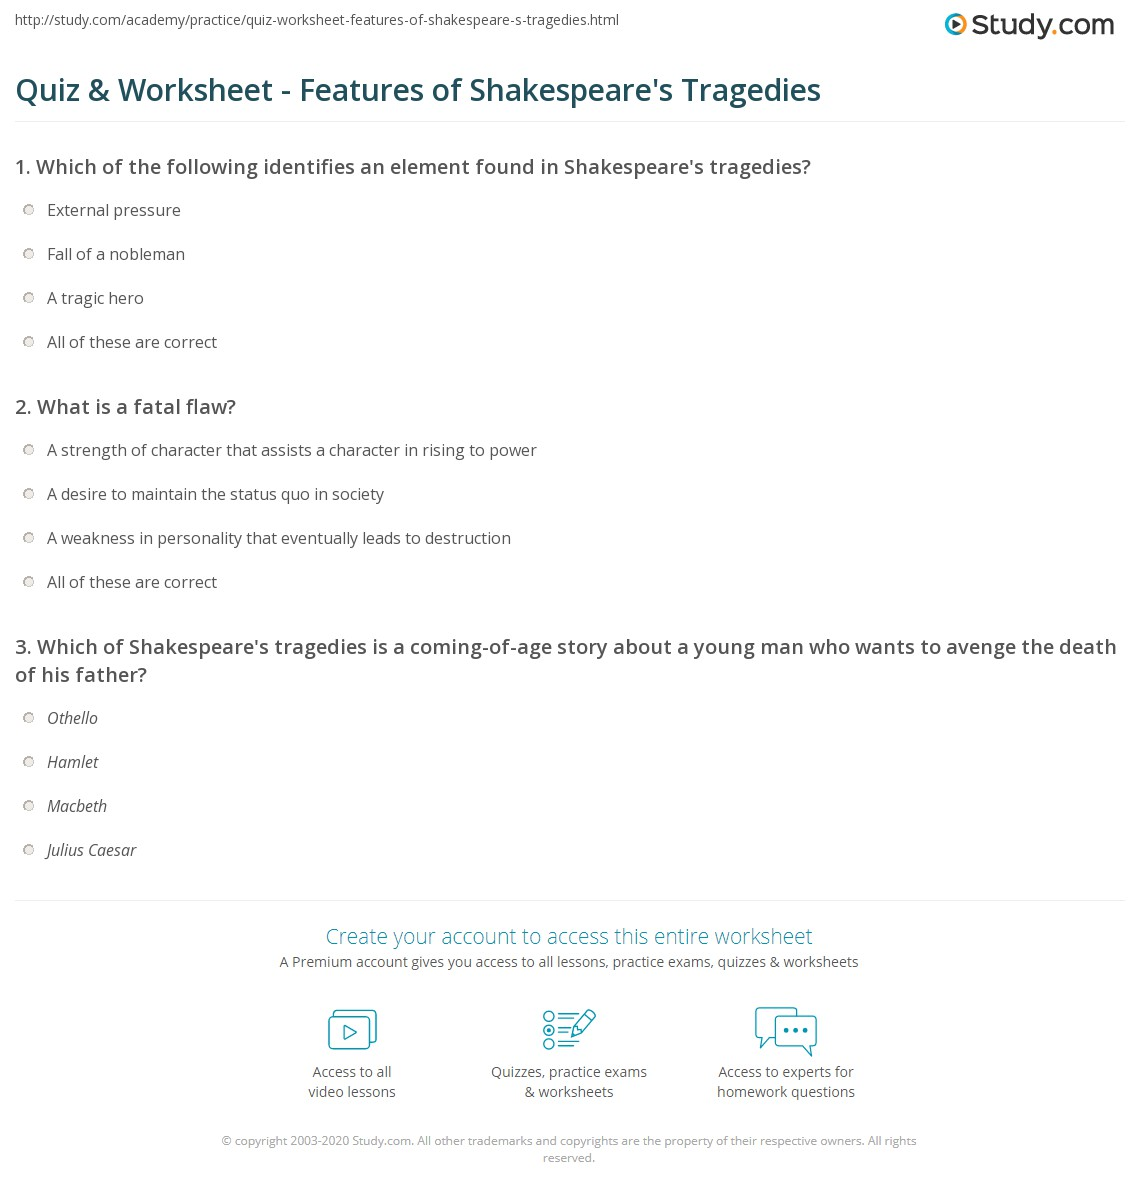 Characteristics Of A Shakespearean Tragic Hero